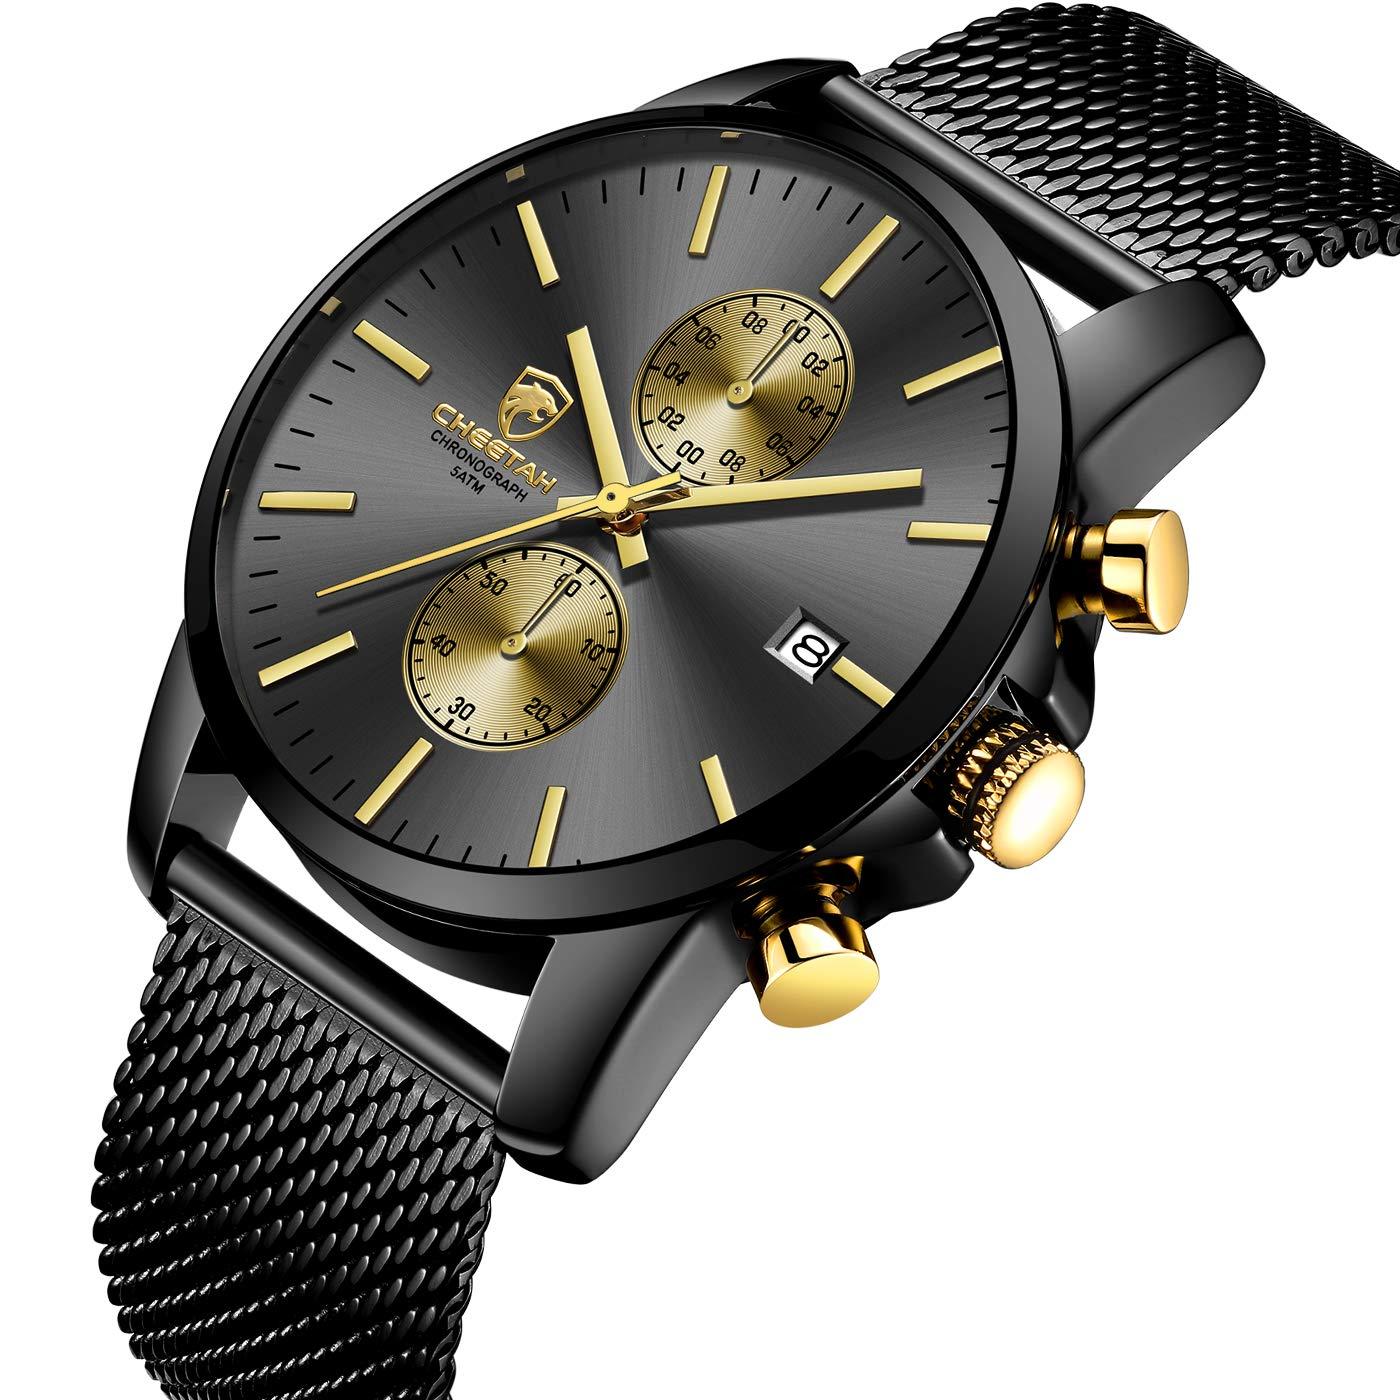 GOLDEN HOUR Men s Watches Fashion Sport Quartz Analog Black Mesh Stainless Steel Waterproof Chronograph Wrist Watch, Auto Date in Blue Red Gold Hands